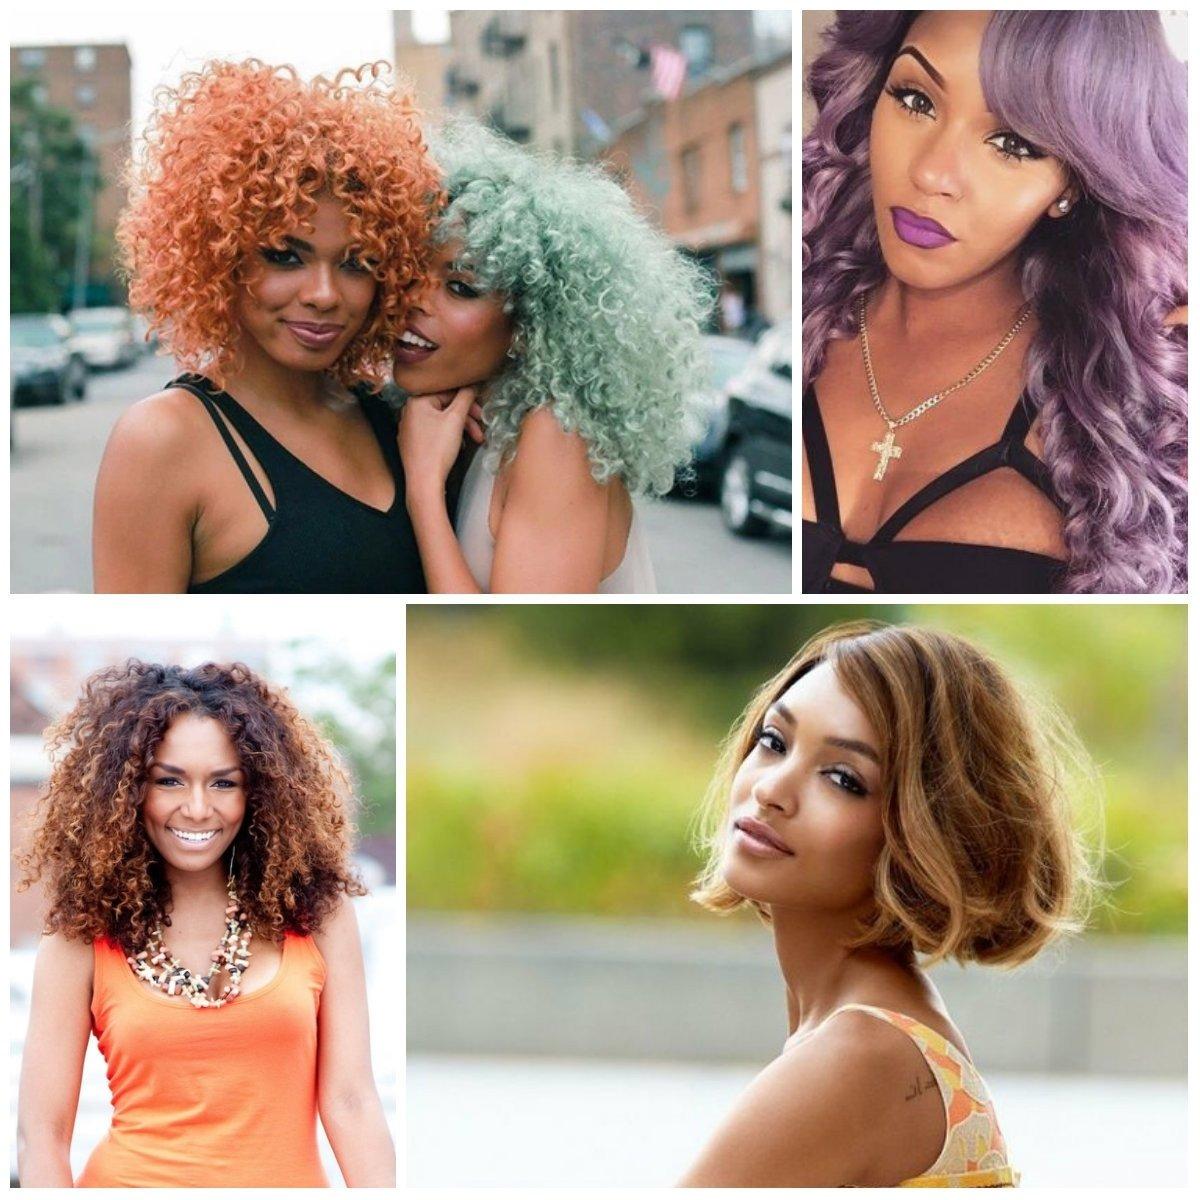 10 Stunning Hair Color Ideas For Dark Skin 2017 hair colors for women with dark skin new hair color ideas 1 2020